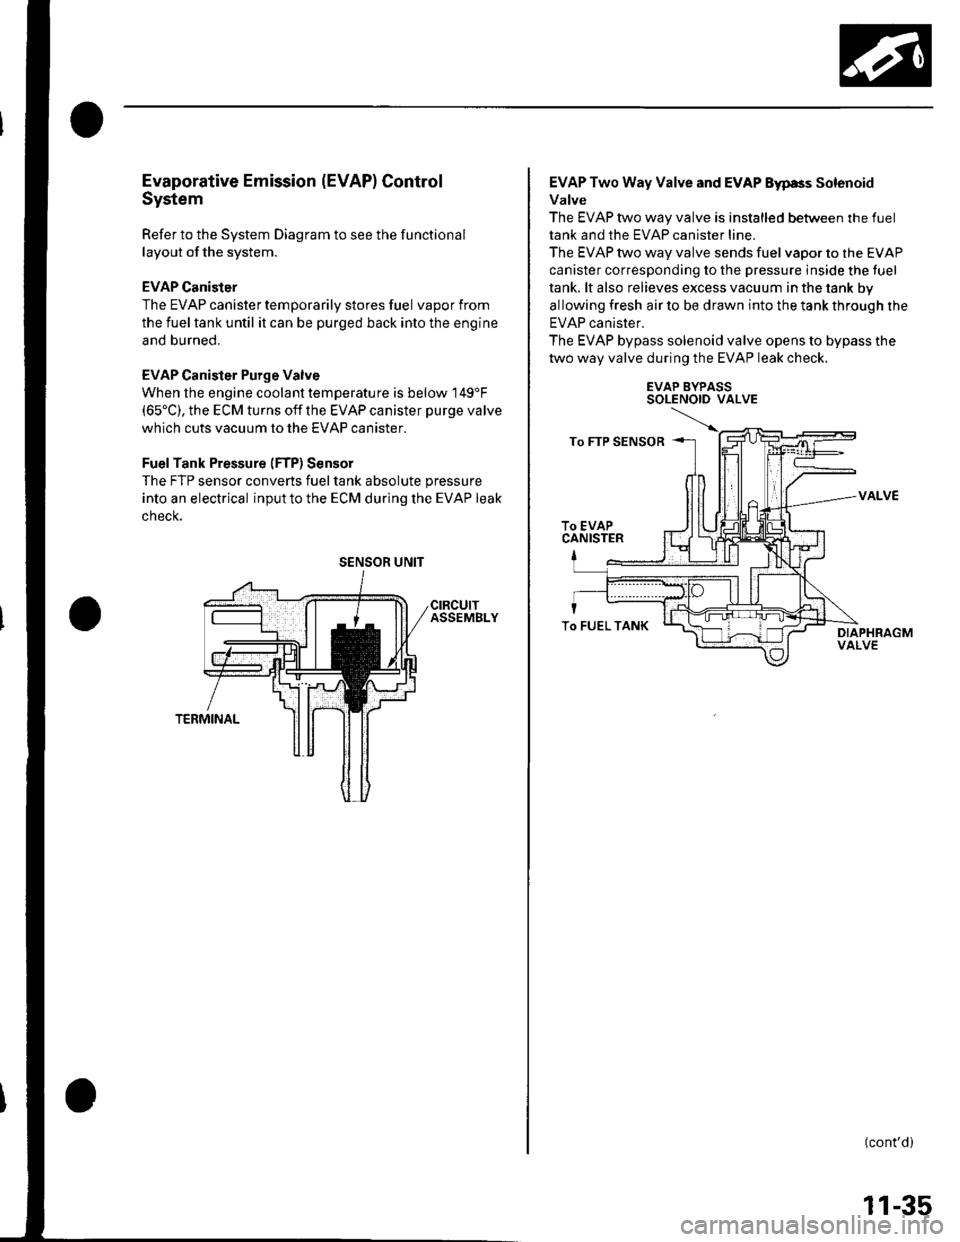 Honda Civic Exhaust Diagram 2002 Honda Civic Idle Air Control Valve